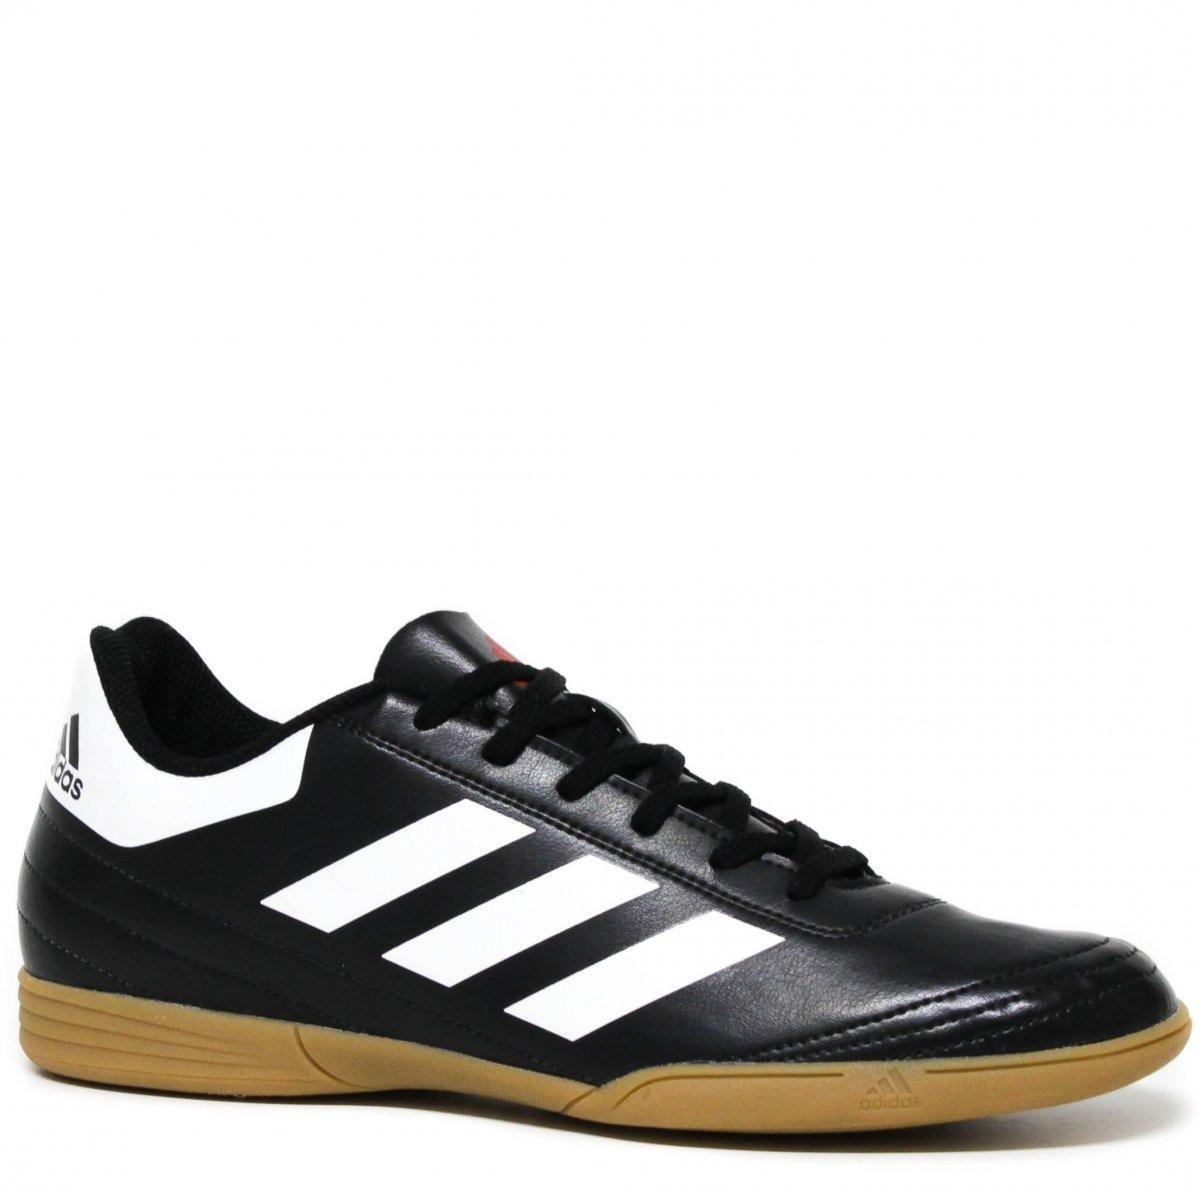 7702b406 Chuteira Futsal adidas Goletto Vi Preto/branco - R$ 194,90 em ...